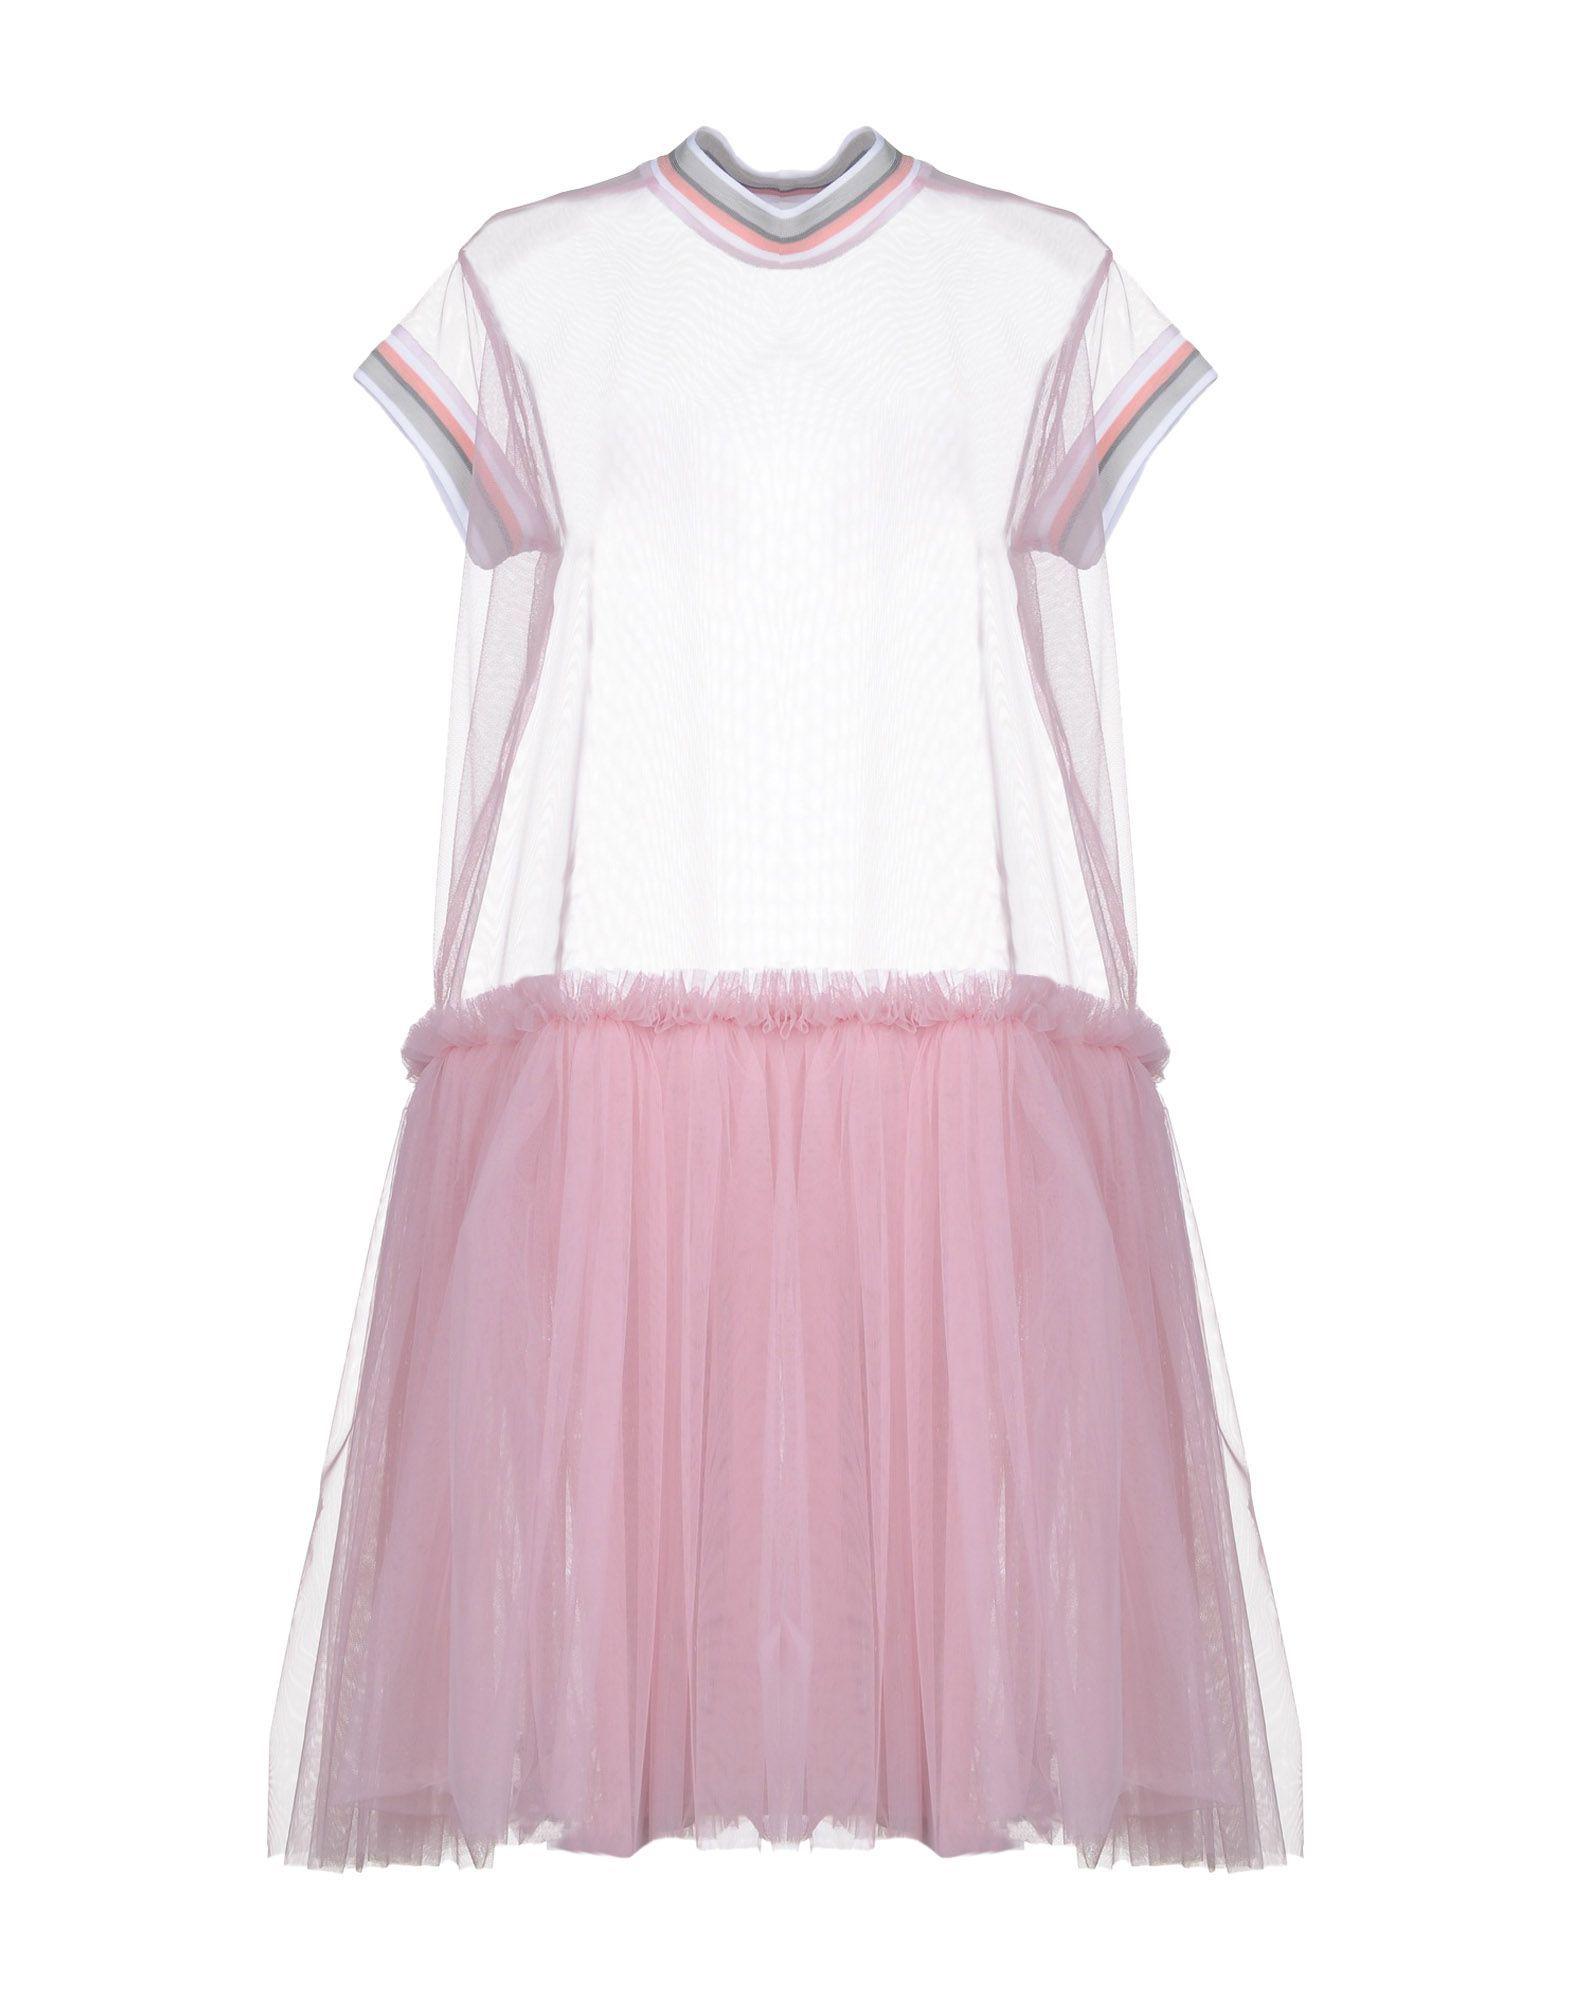 DRESSES - Short dresses Scrambled_ego Clearance Huge Surprise tIxz1lhxd3